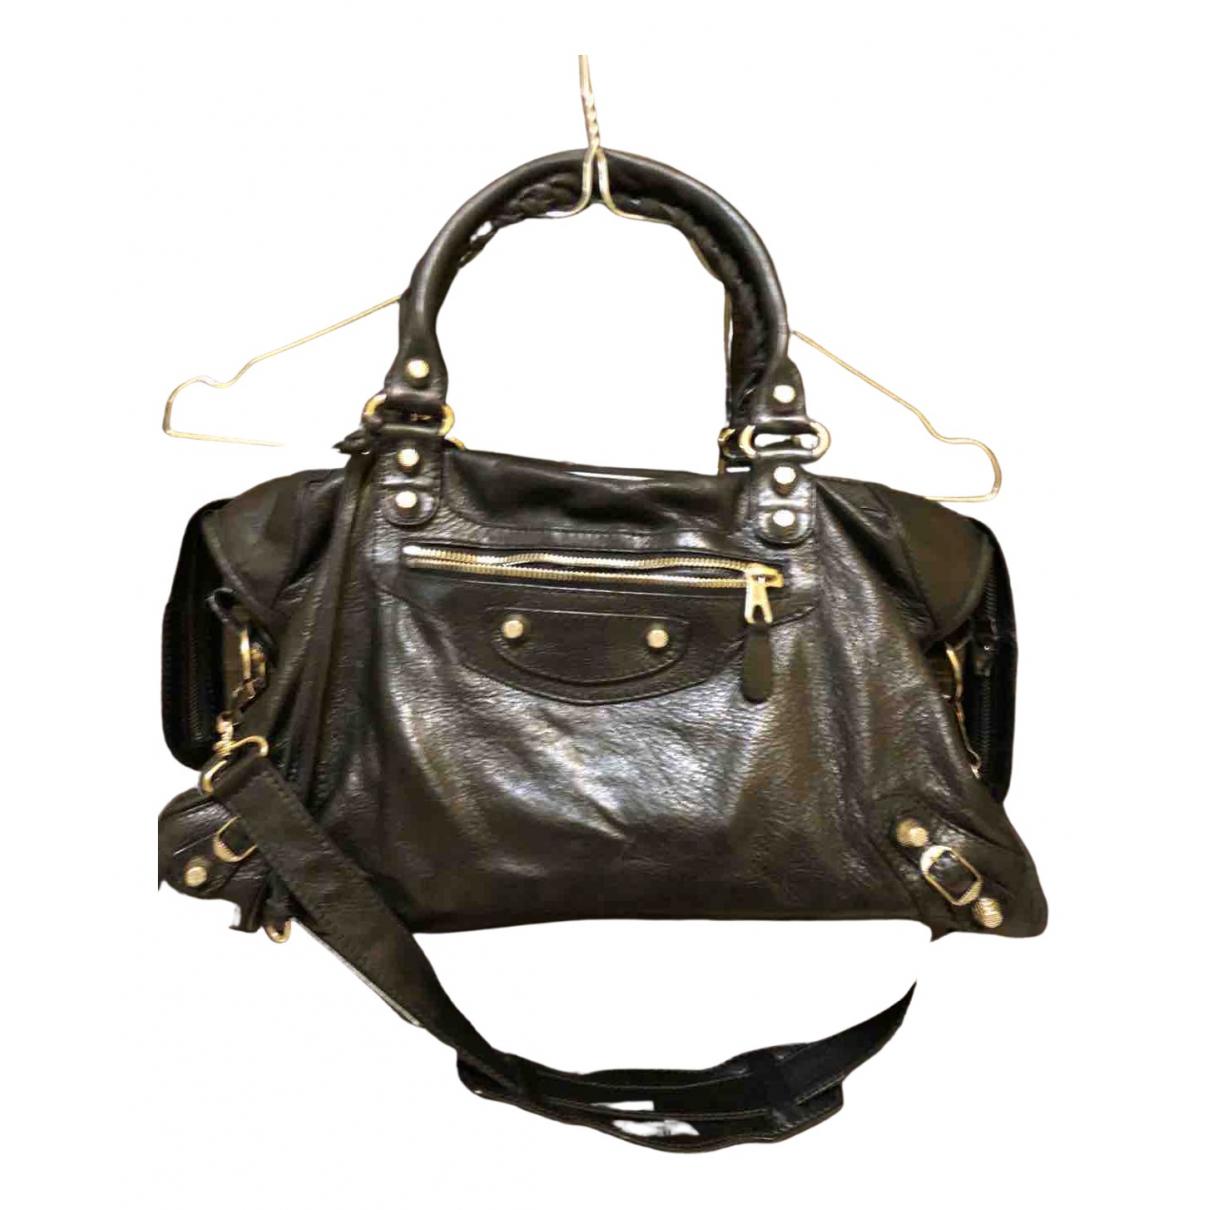 Balenciaga City Black Leather handbag for Women N